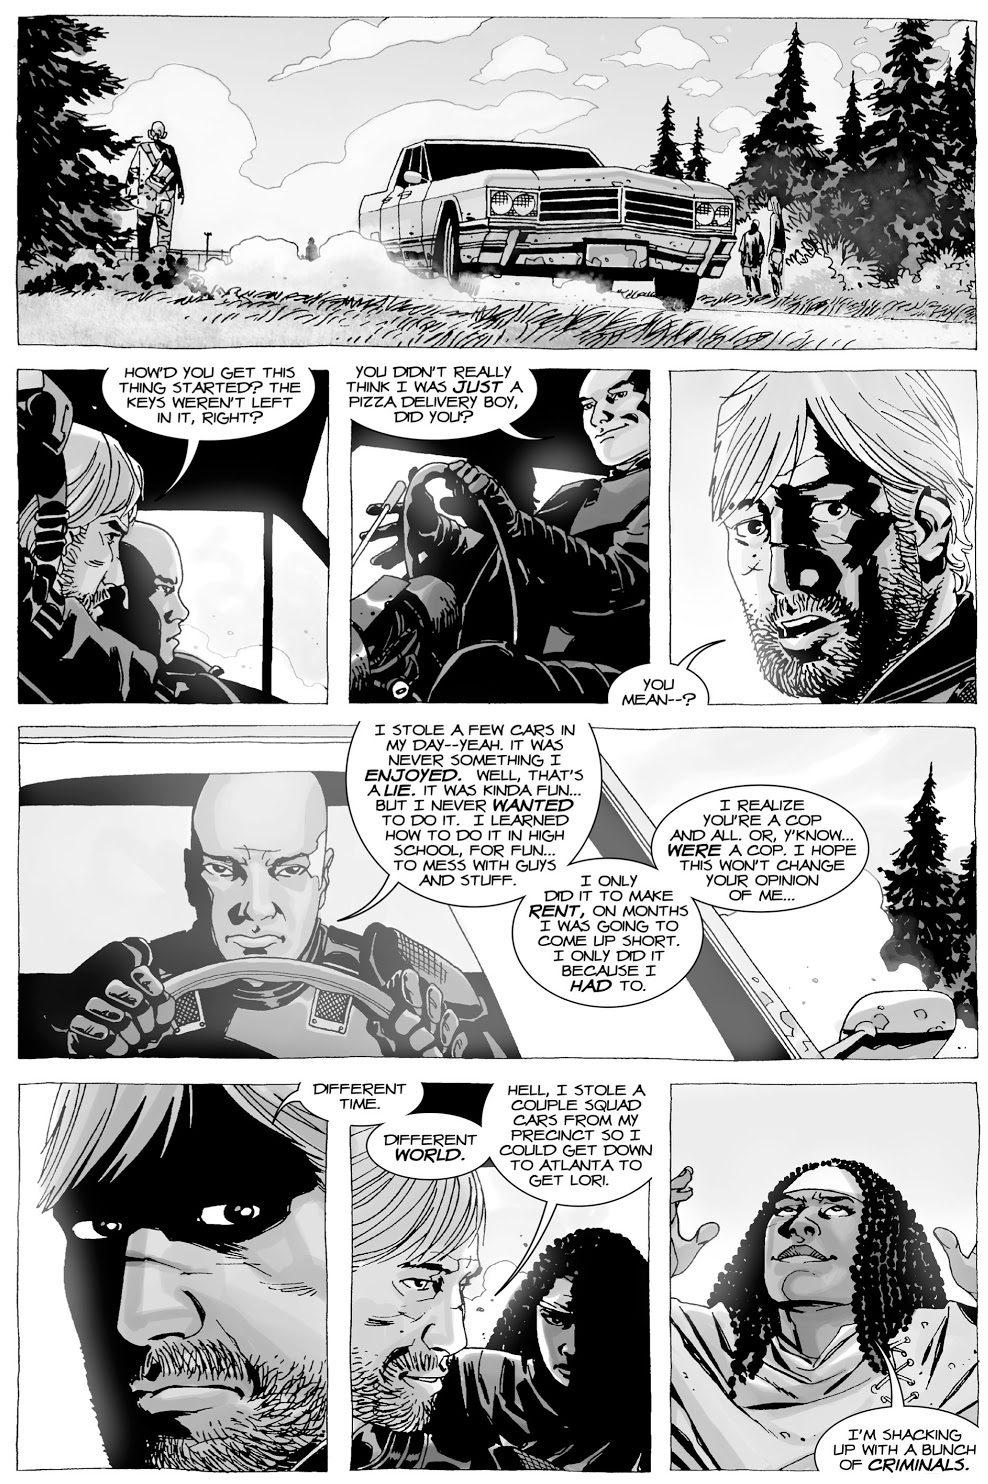 Glenn Rhee's Criminal Past (The Walking Dead)